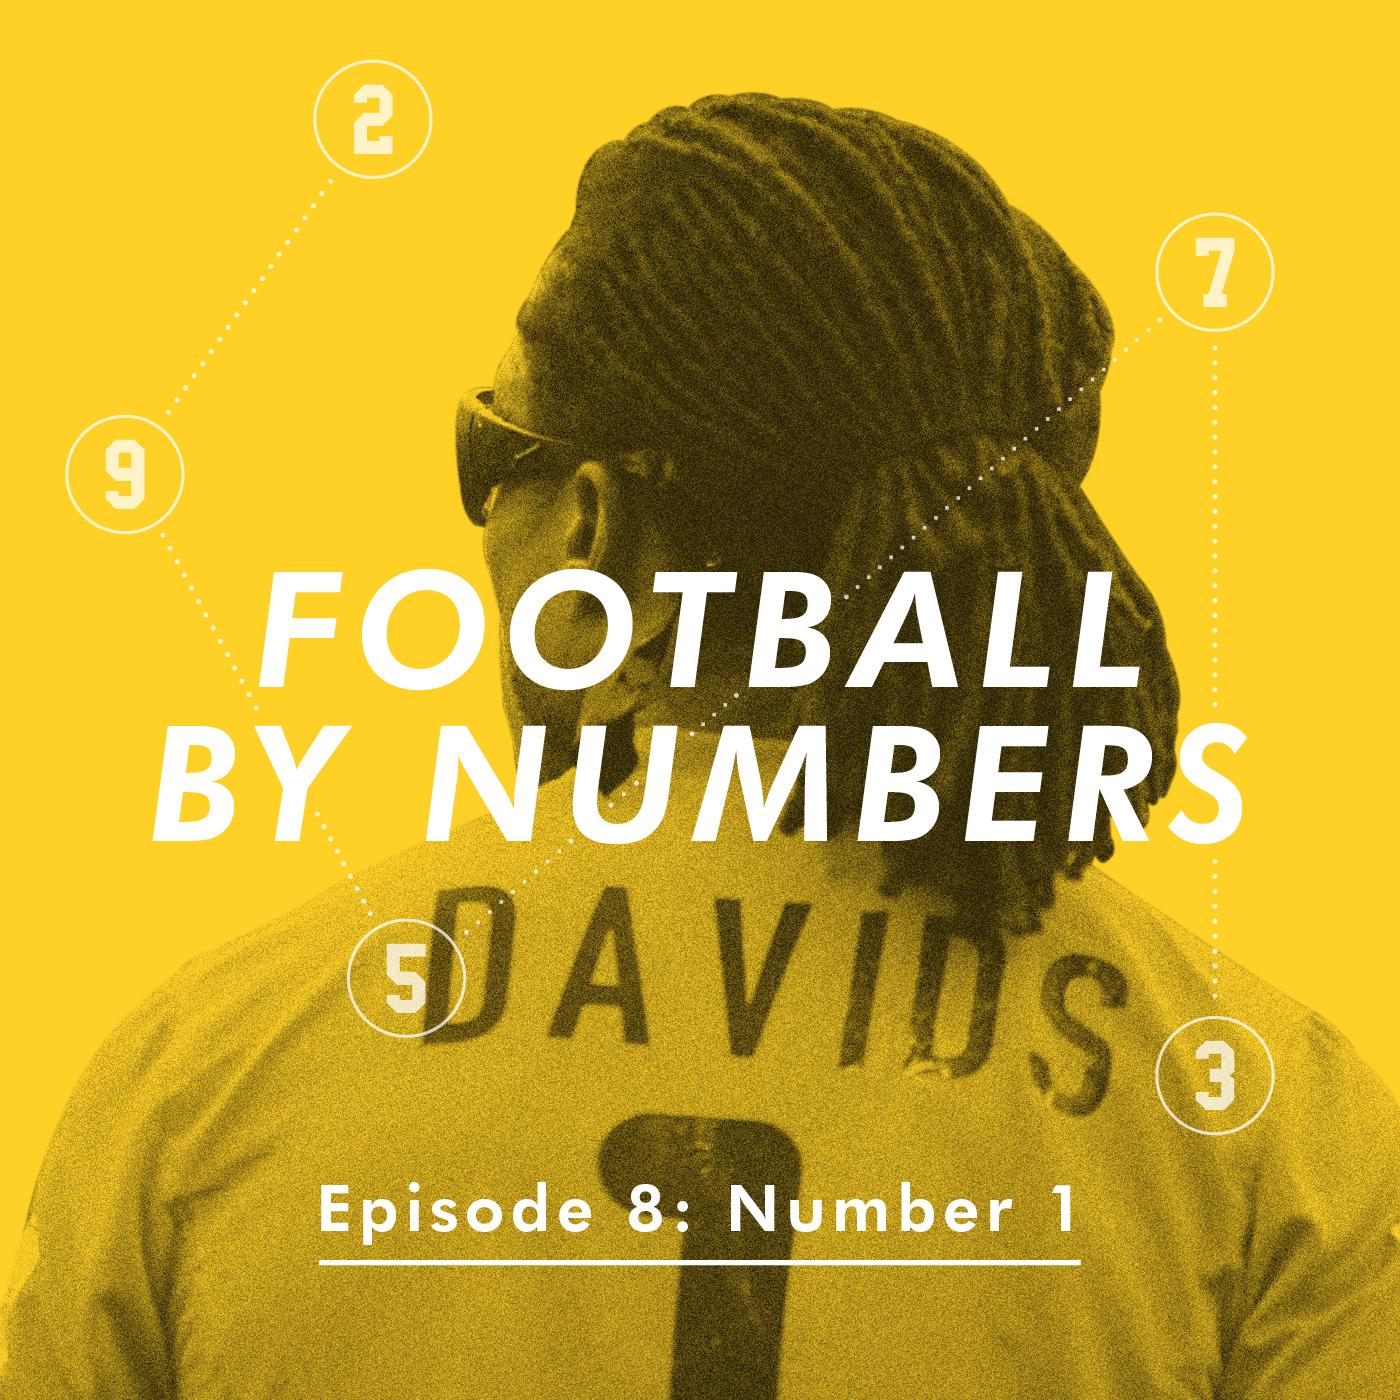 FootballByNumbers-Covers-E8.jpg